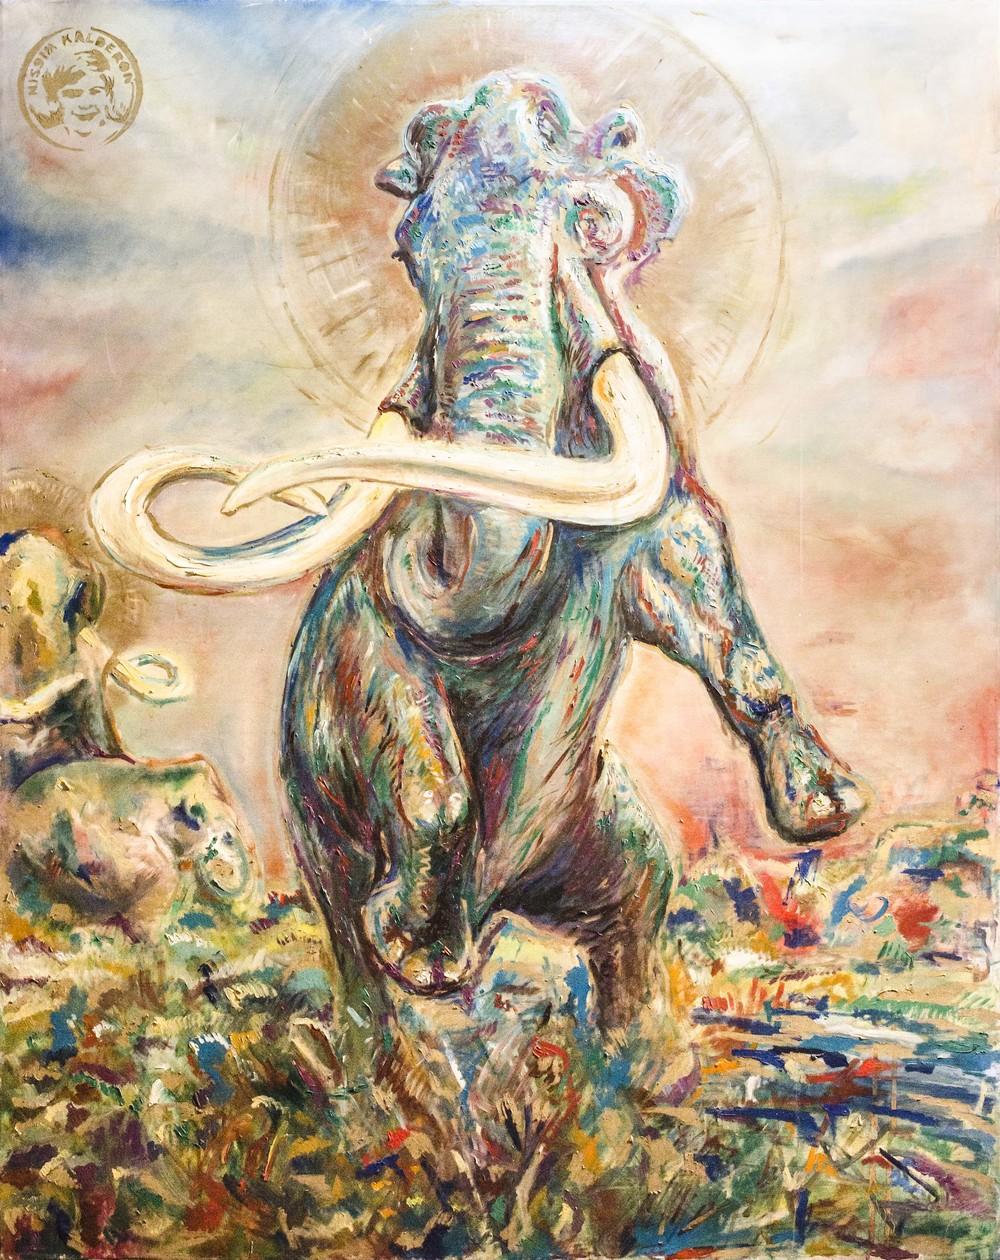 Mammoth, 2009